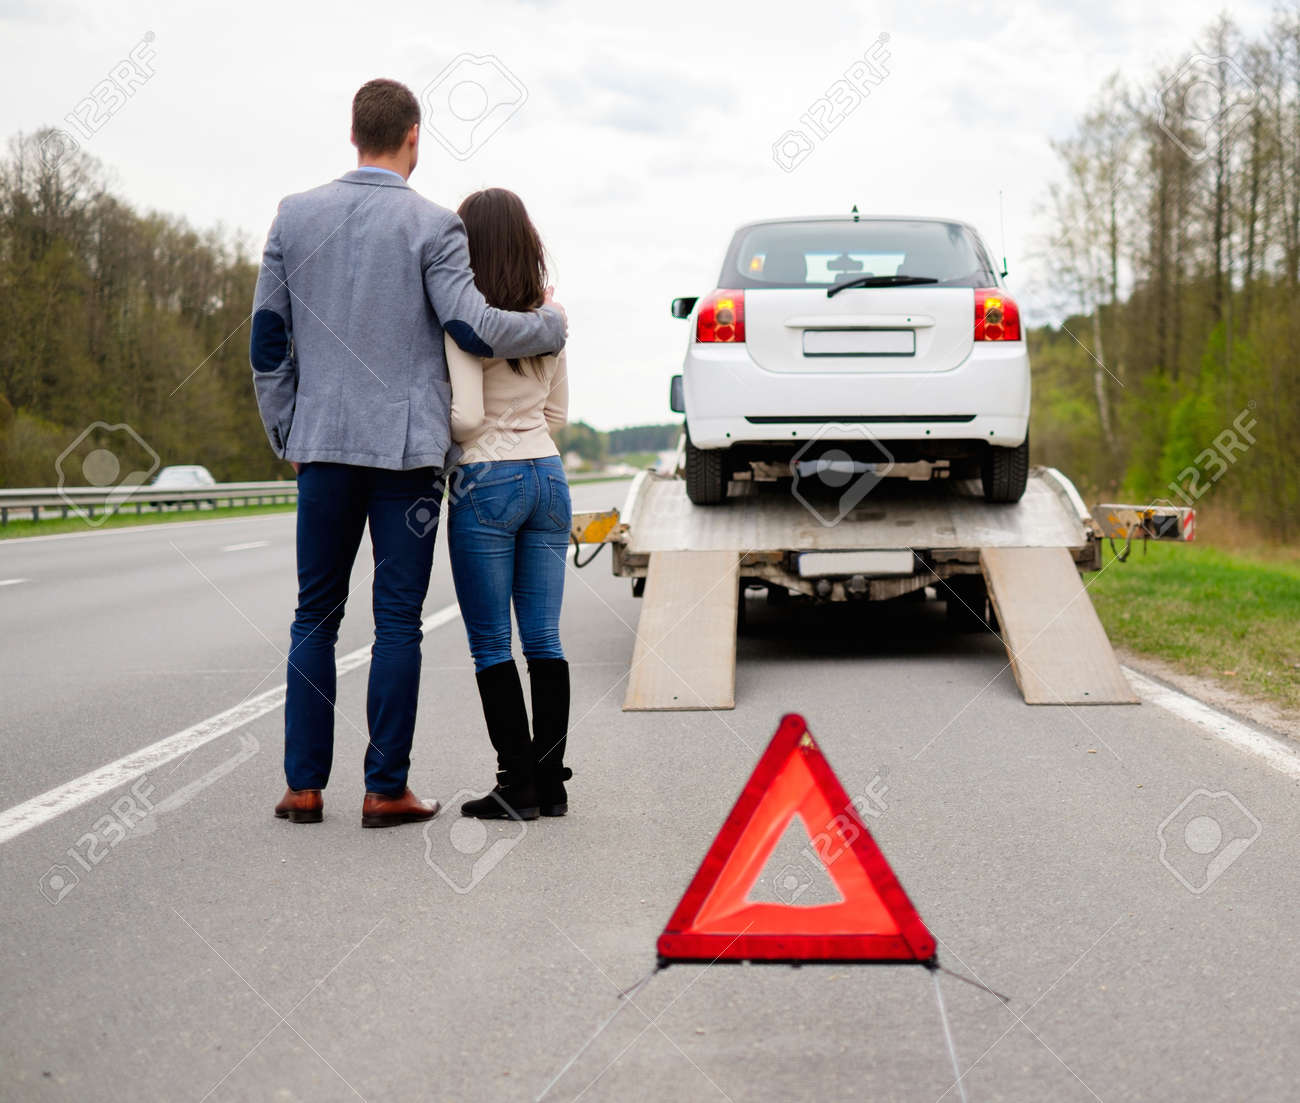 Couple near tow-truck picking up broken car - 39546097